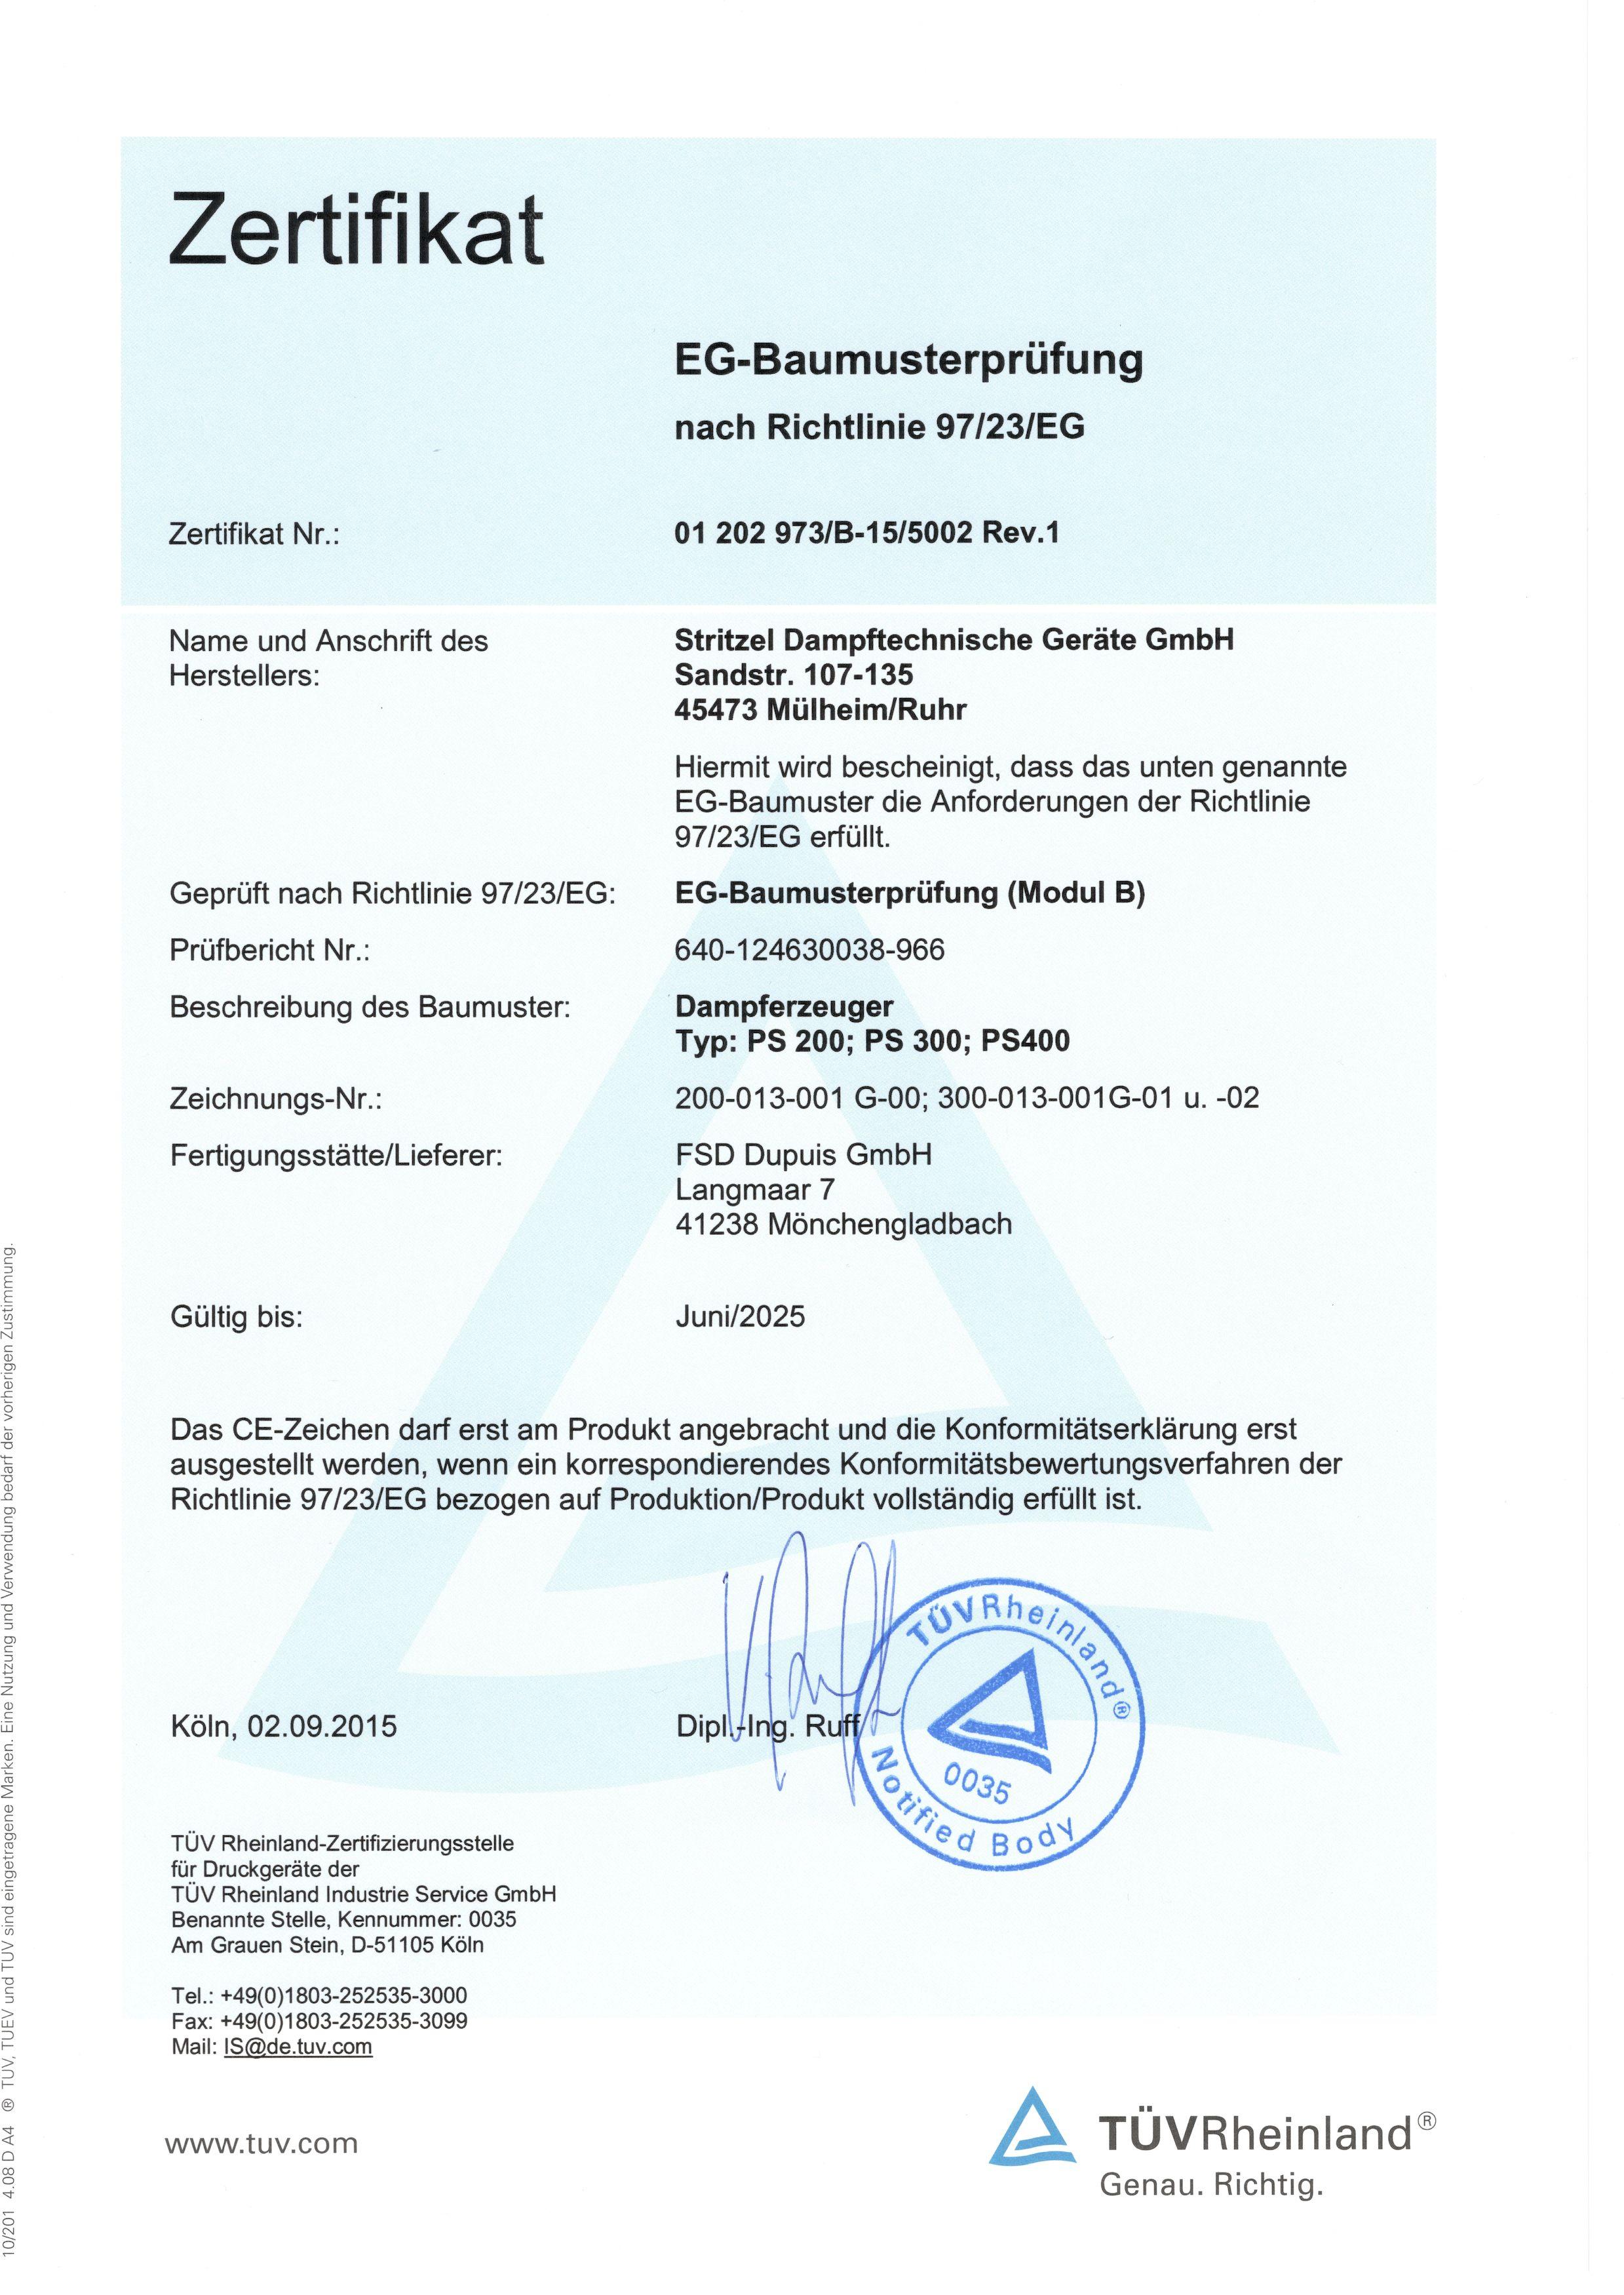 Dampferzeuger - Baumusterprüfung